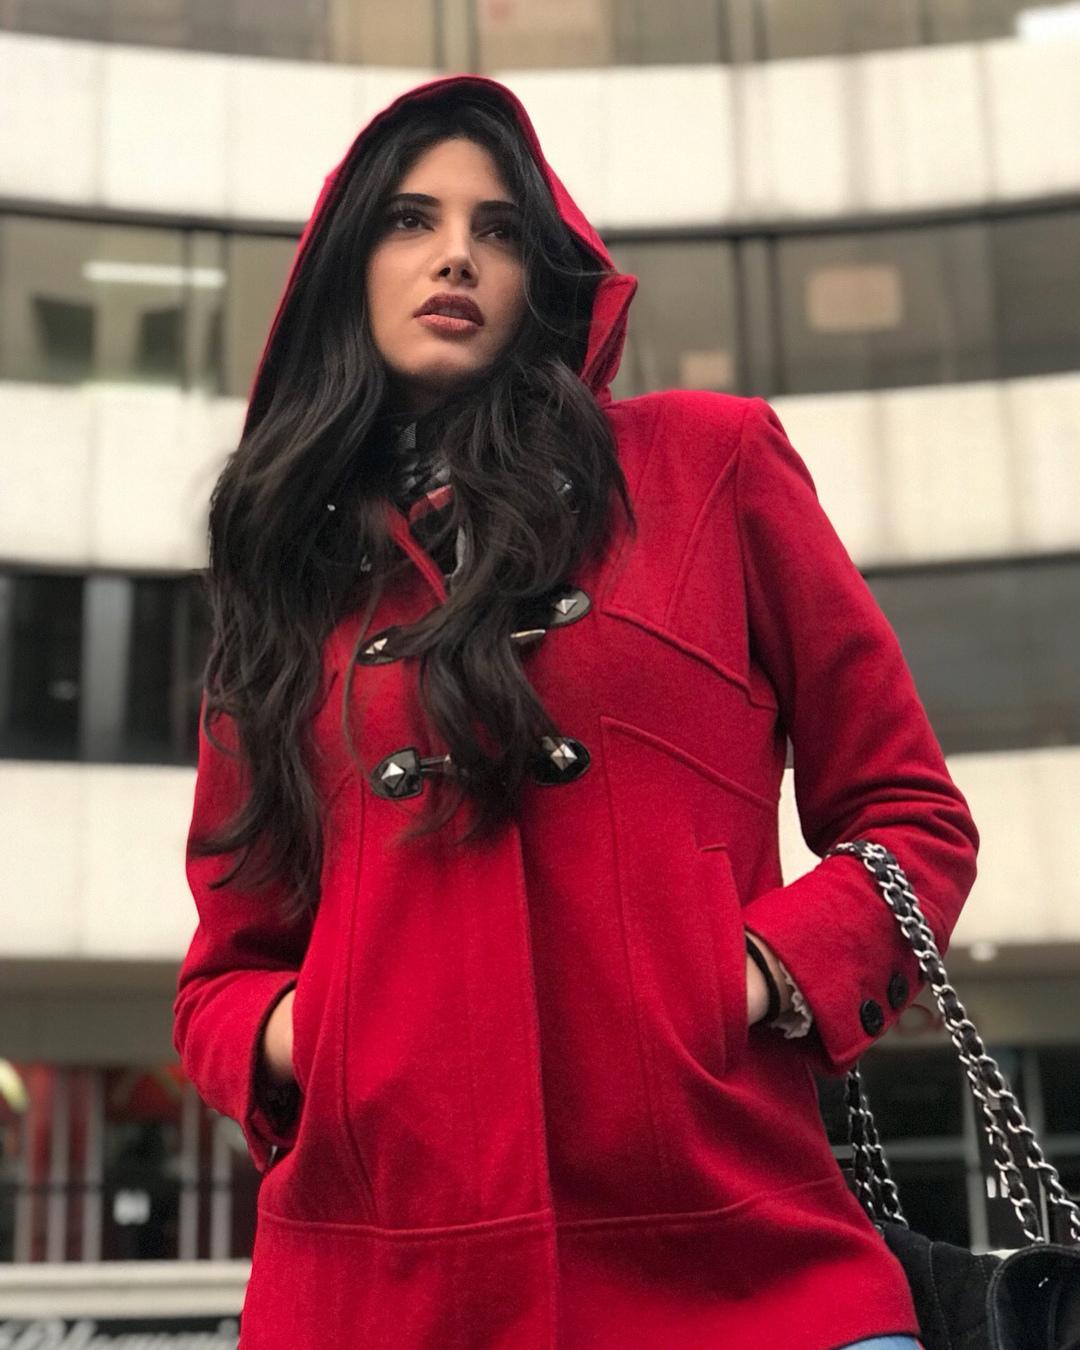 nariman battikha, reyna hispanoamericana 2018/top 10 de miss supranational 2018. - Página 2 37030910